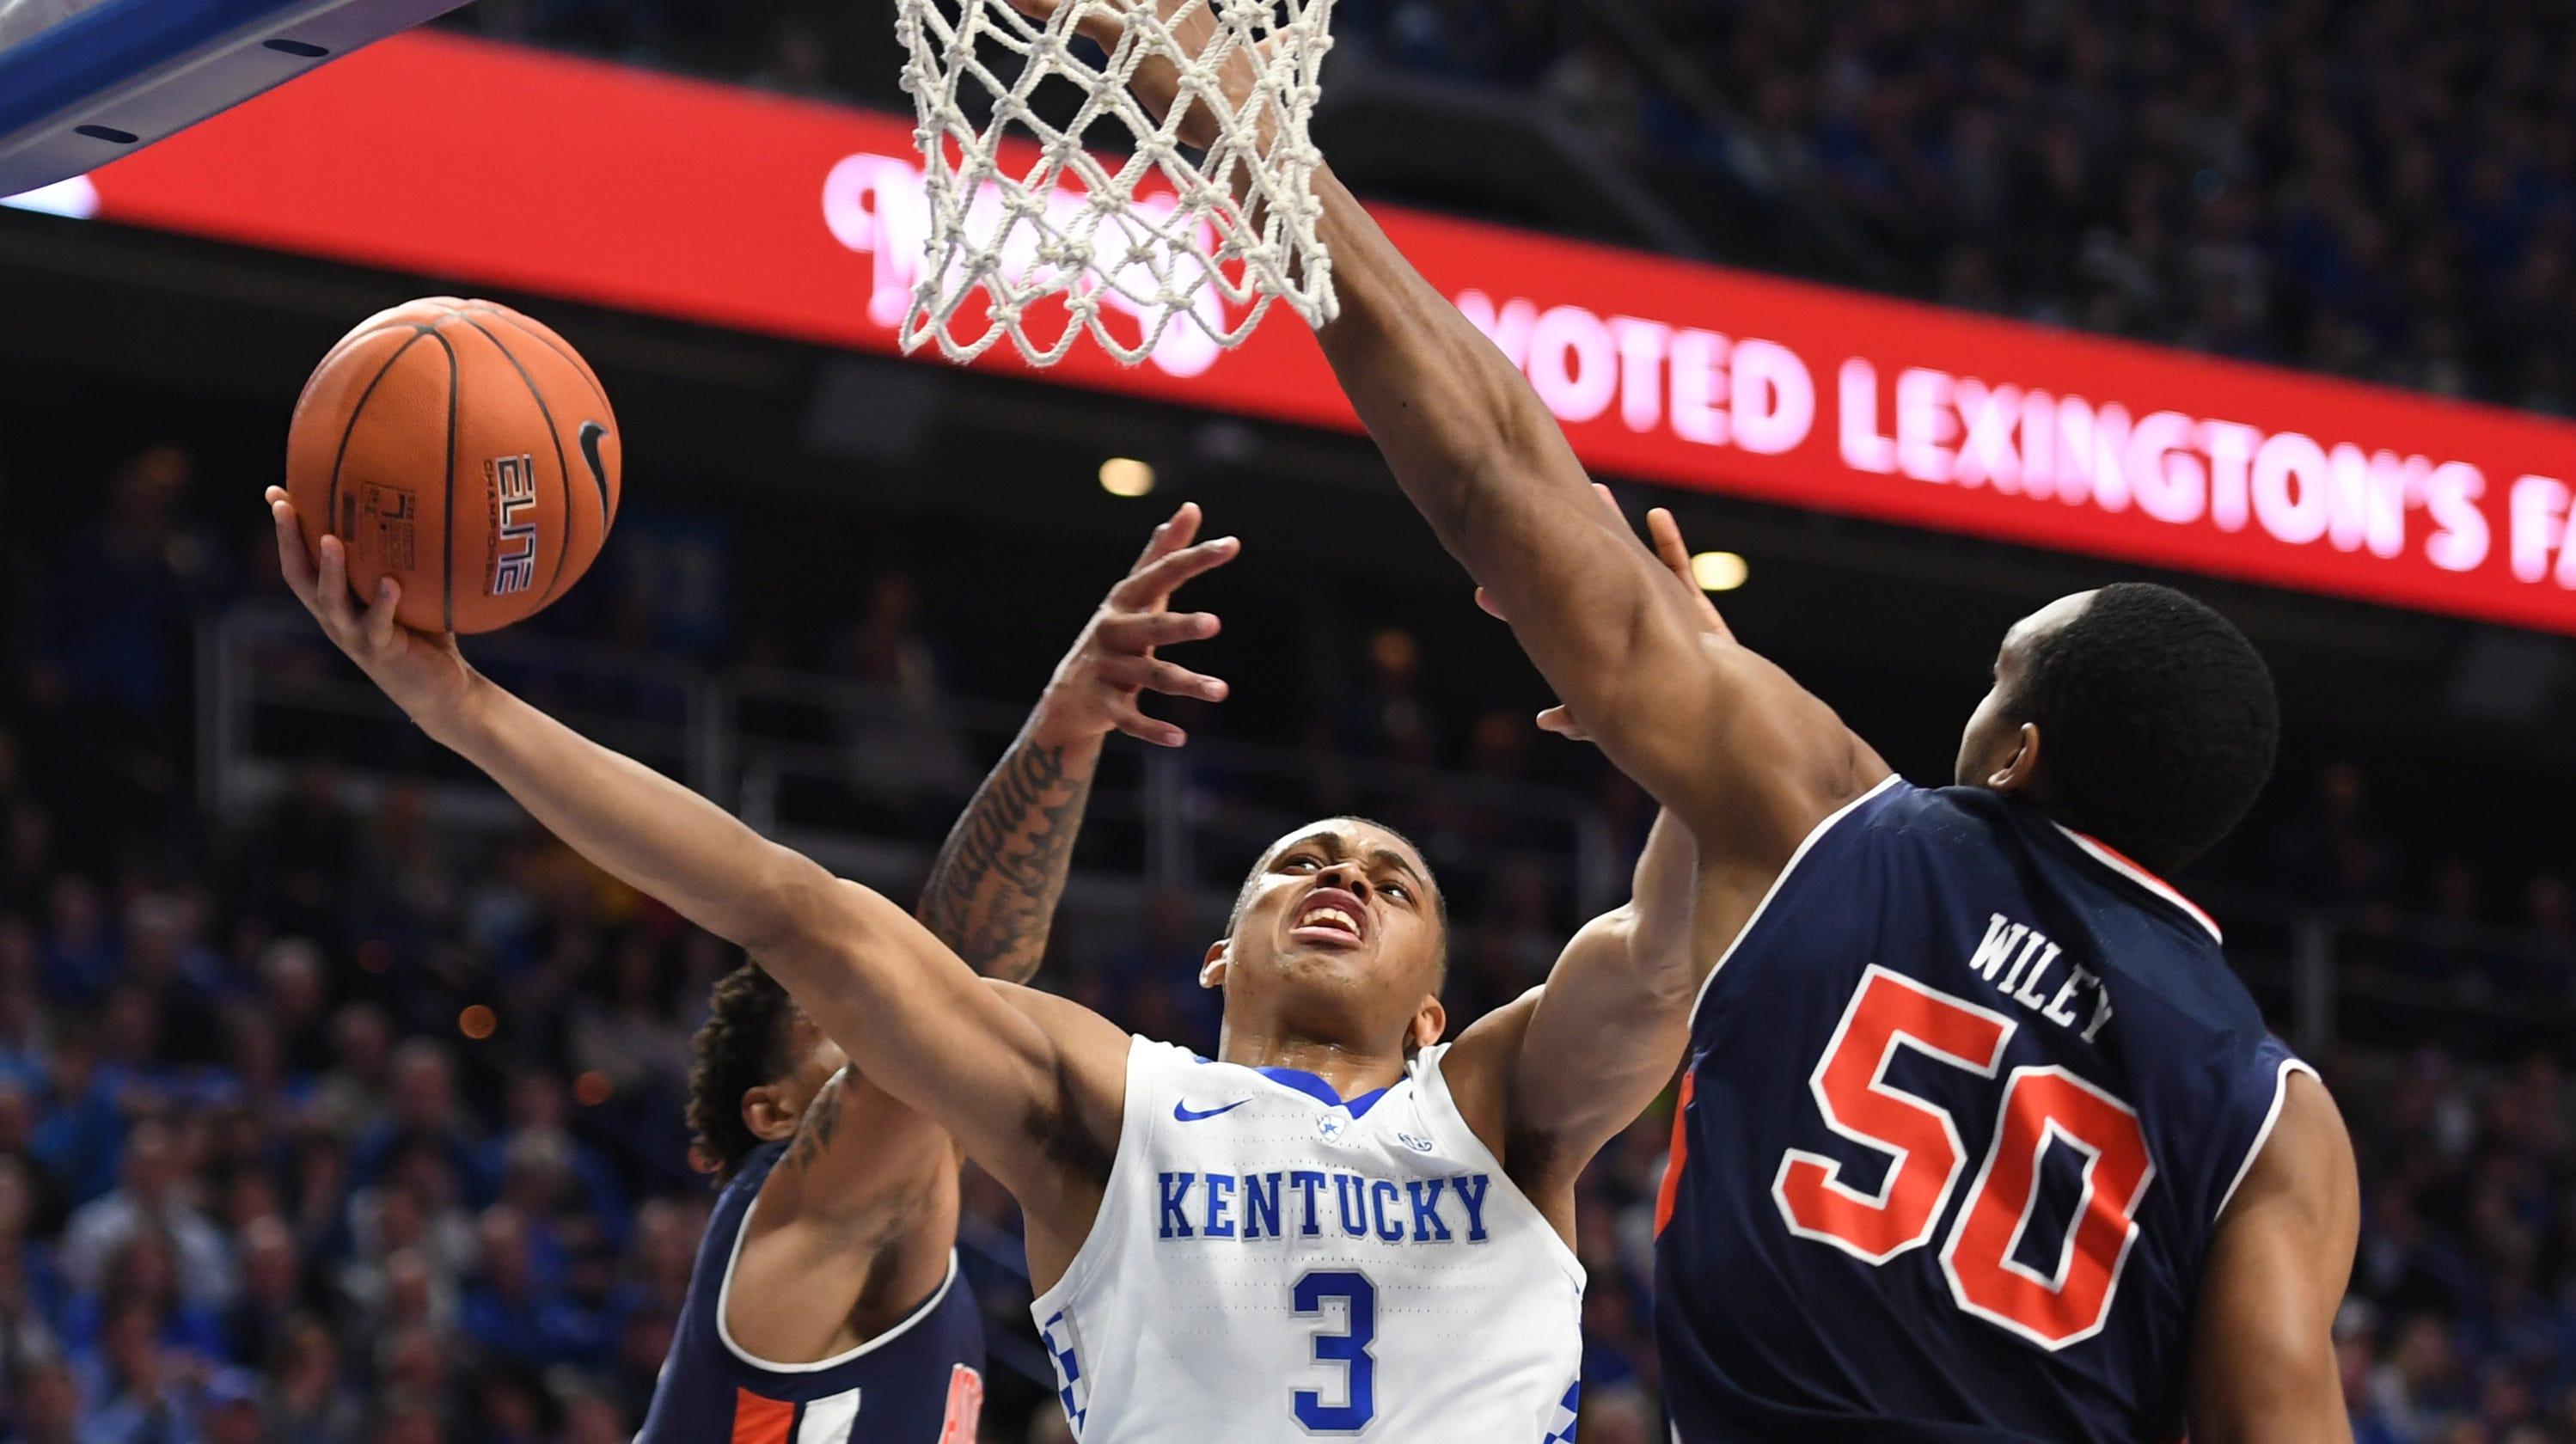 March Madness How To Watch Kentucky Basketball Vs Auburn